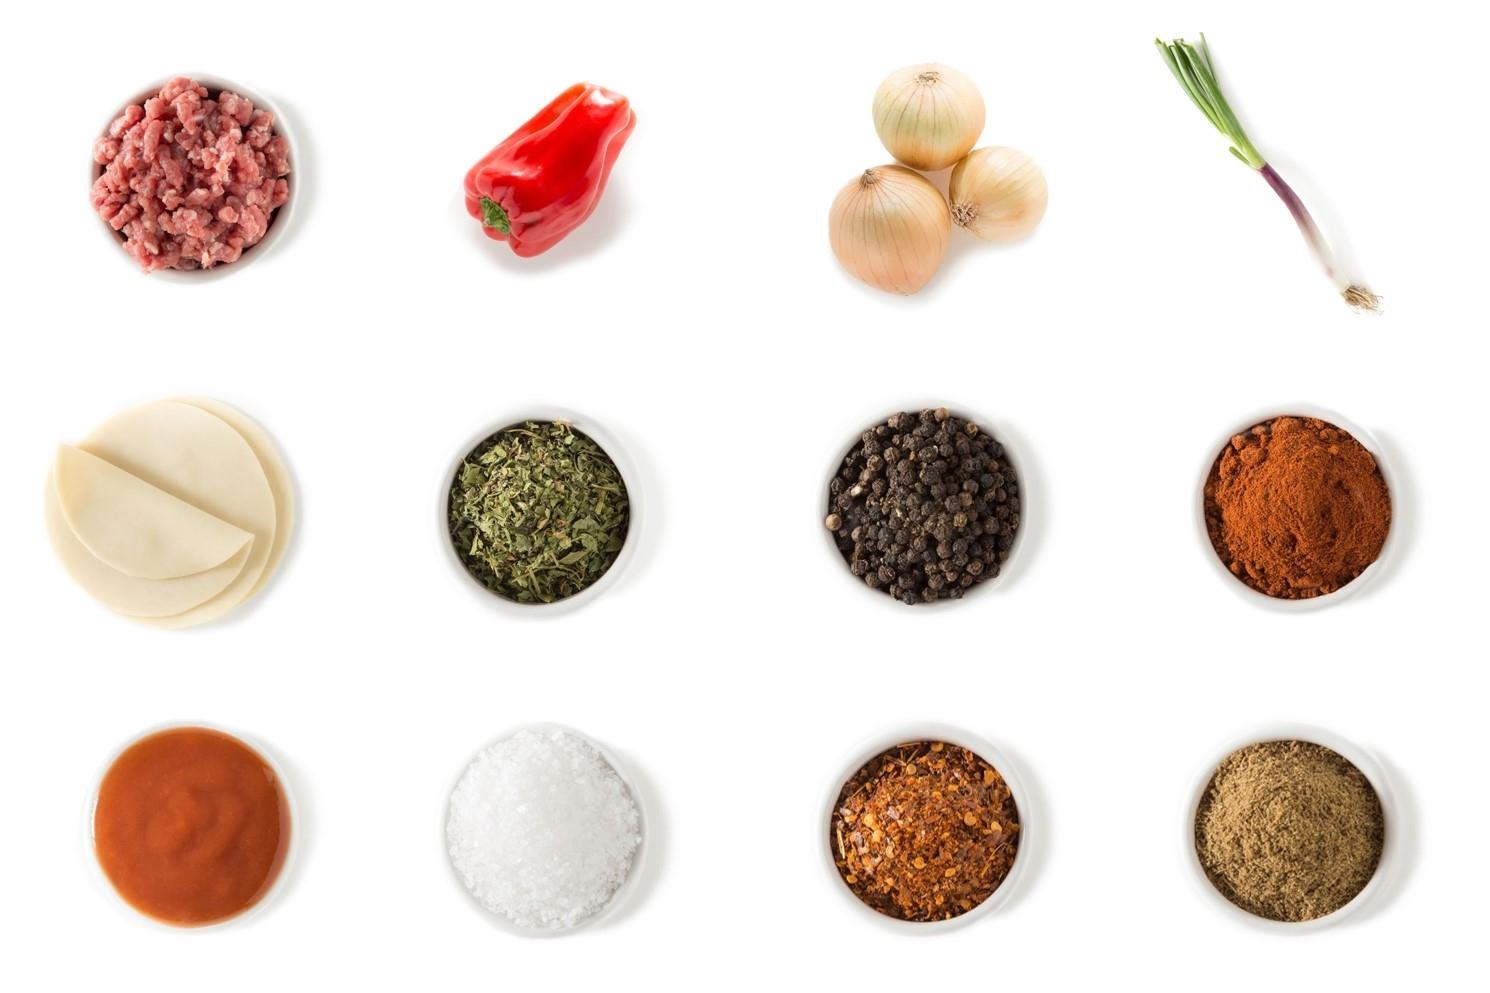 Empanada_Carne ingredientes